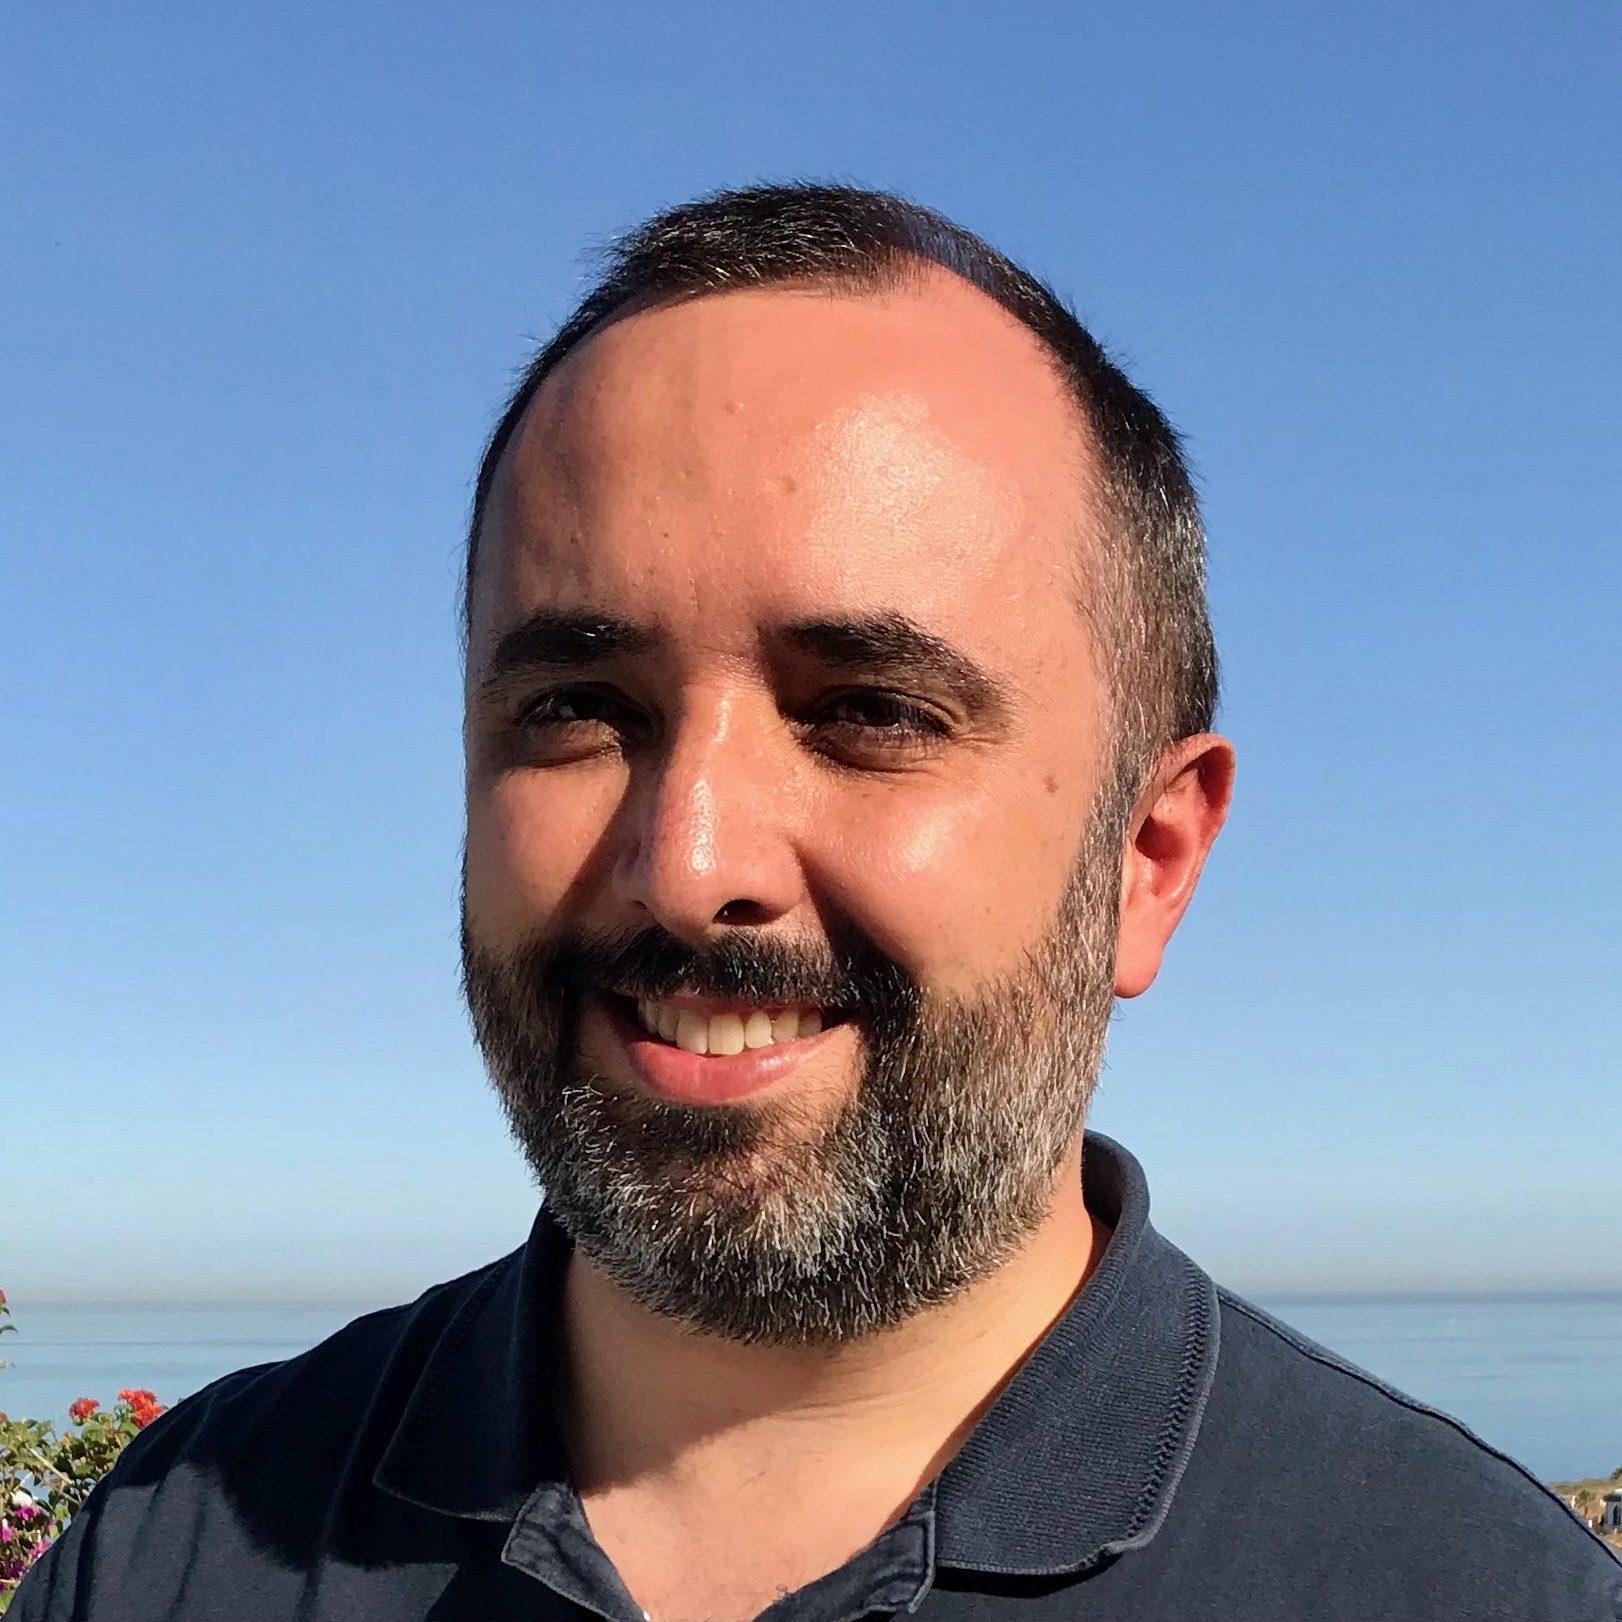 Emanuel Peter Patrioli